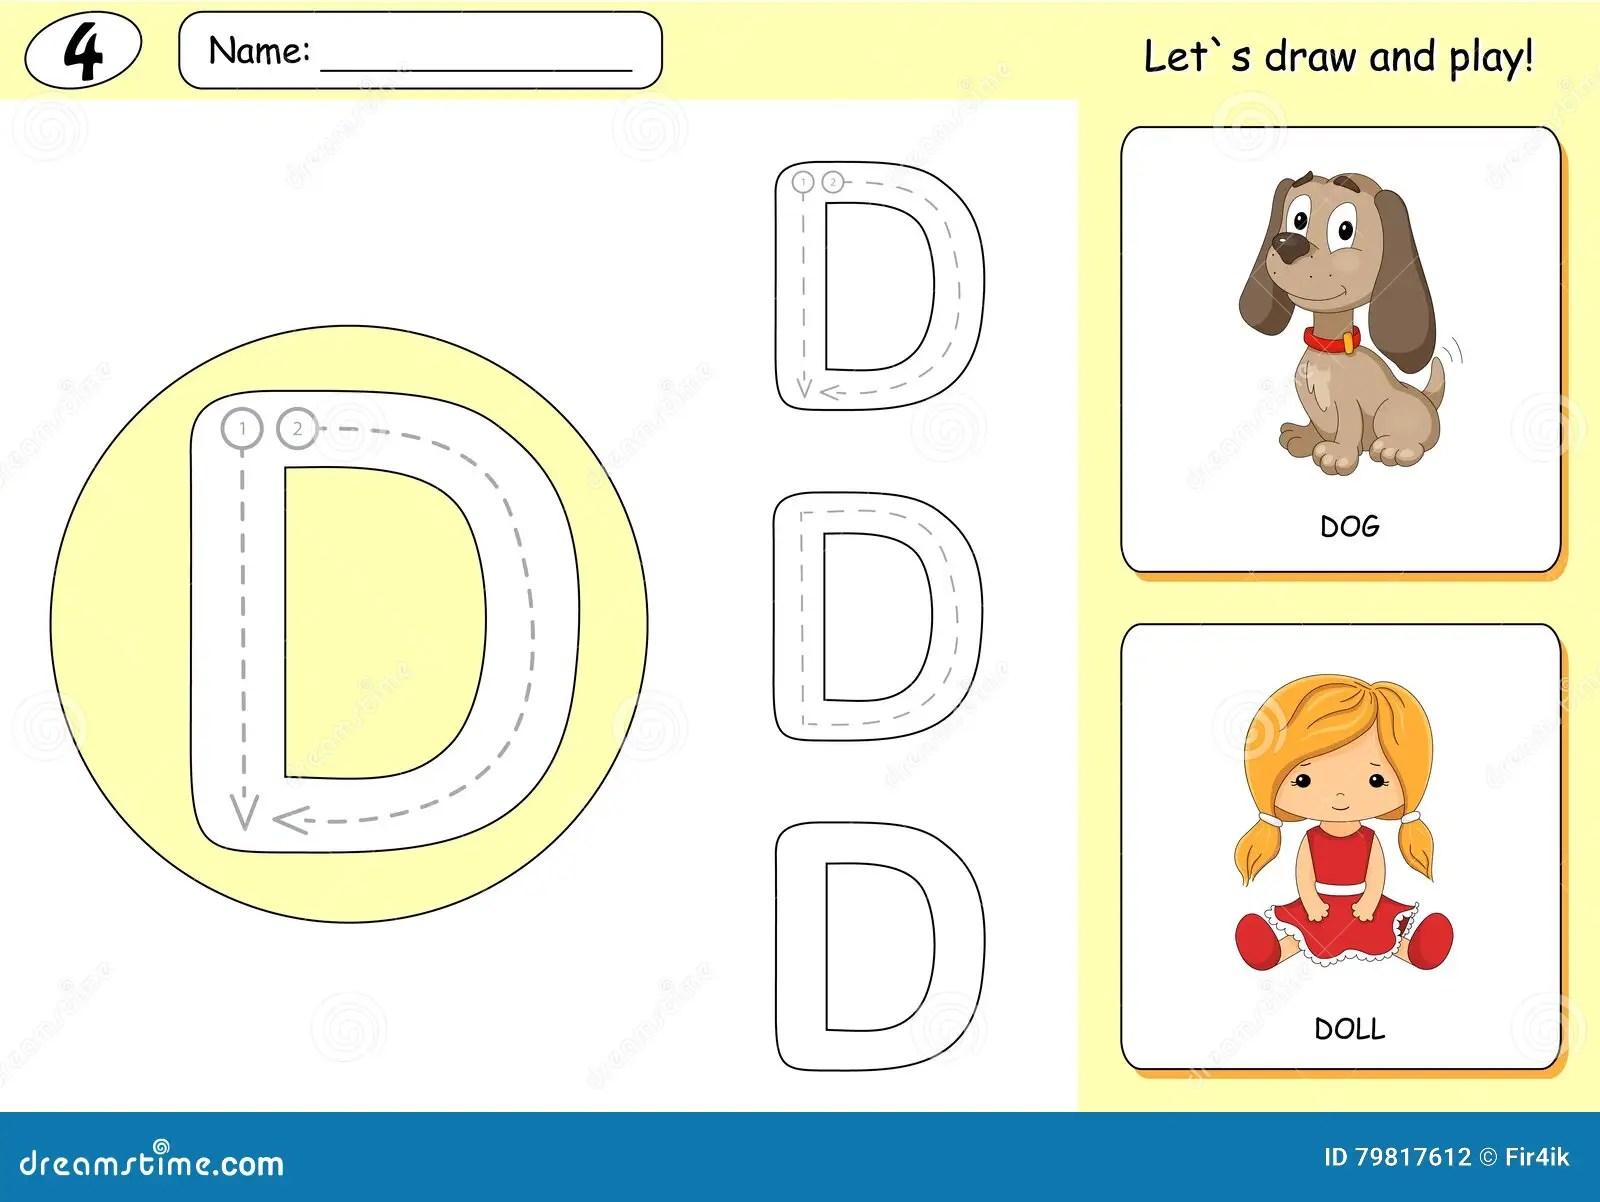 Cartoon Dog And Doll Alphabet Tracing Worksheet Writing